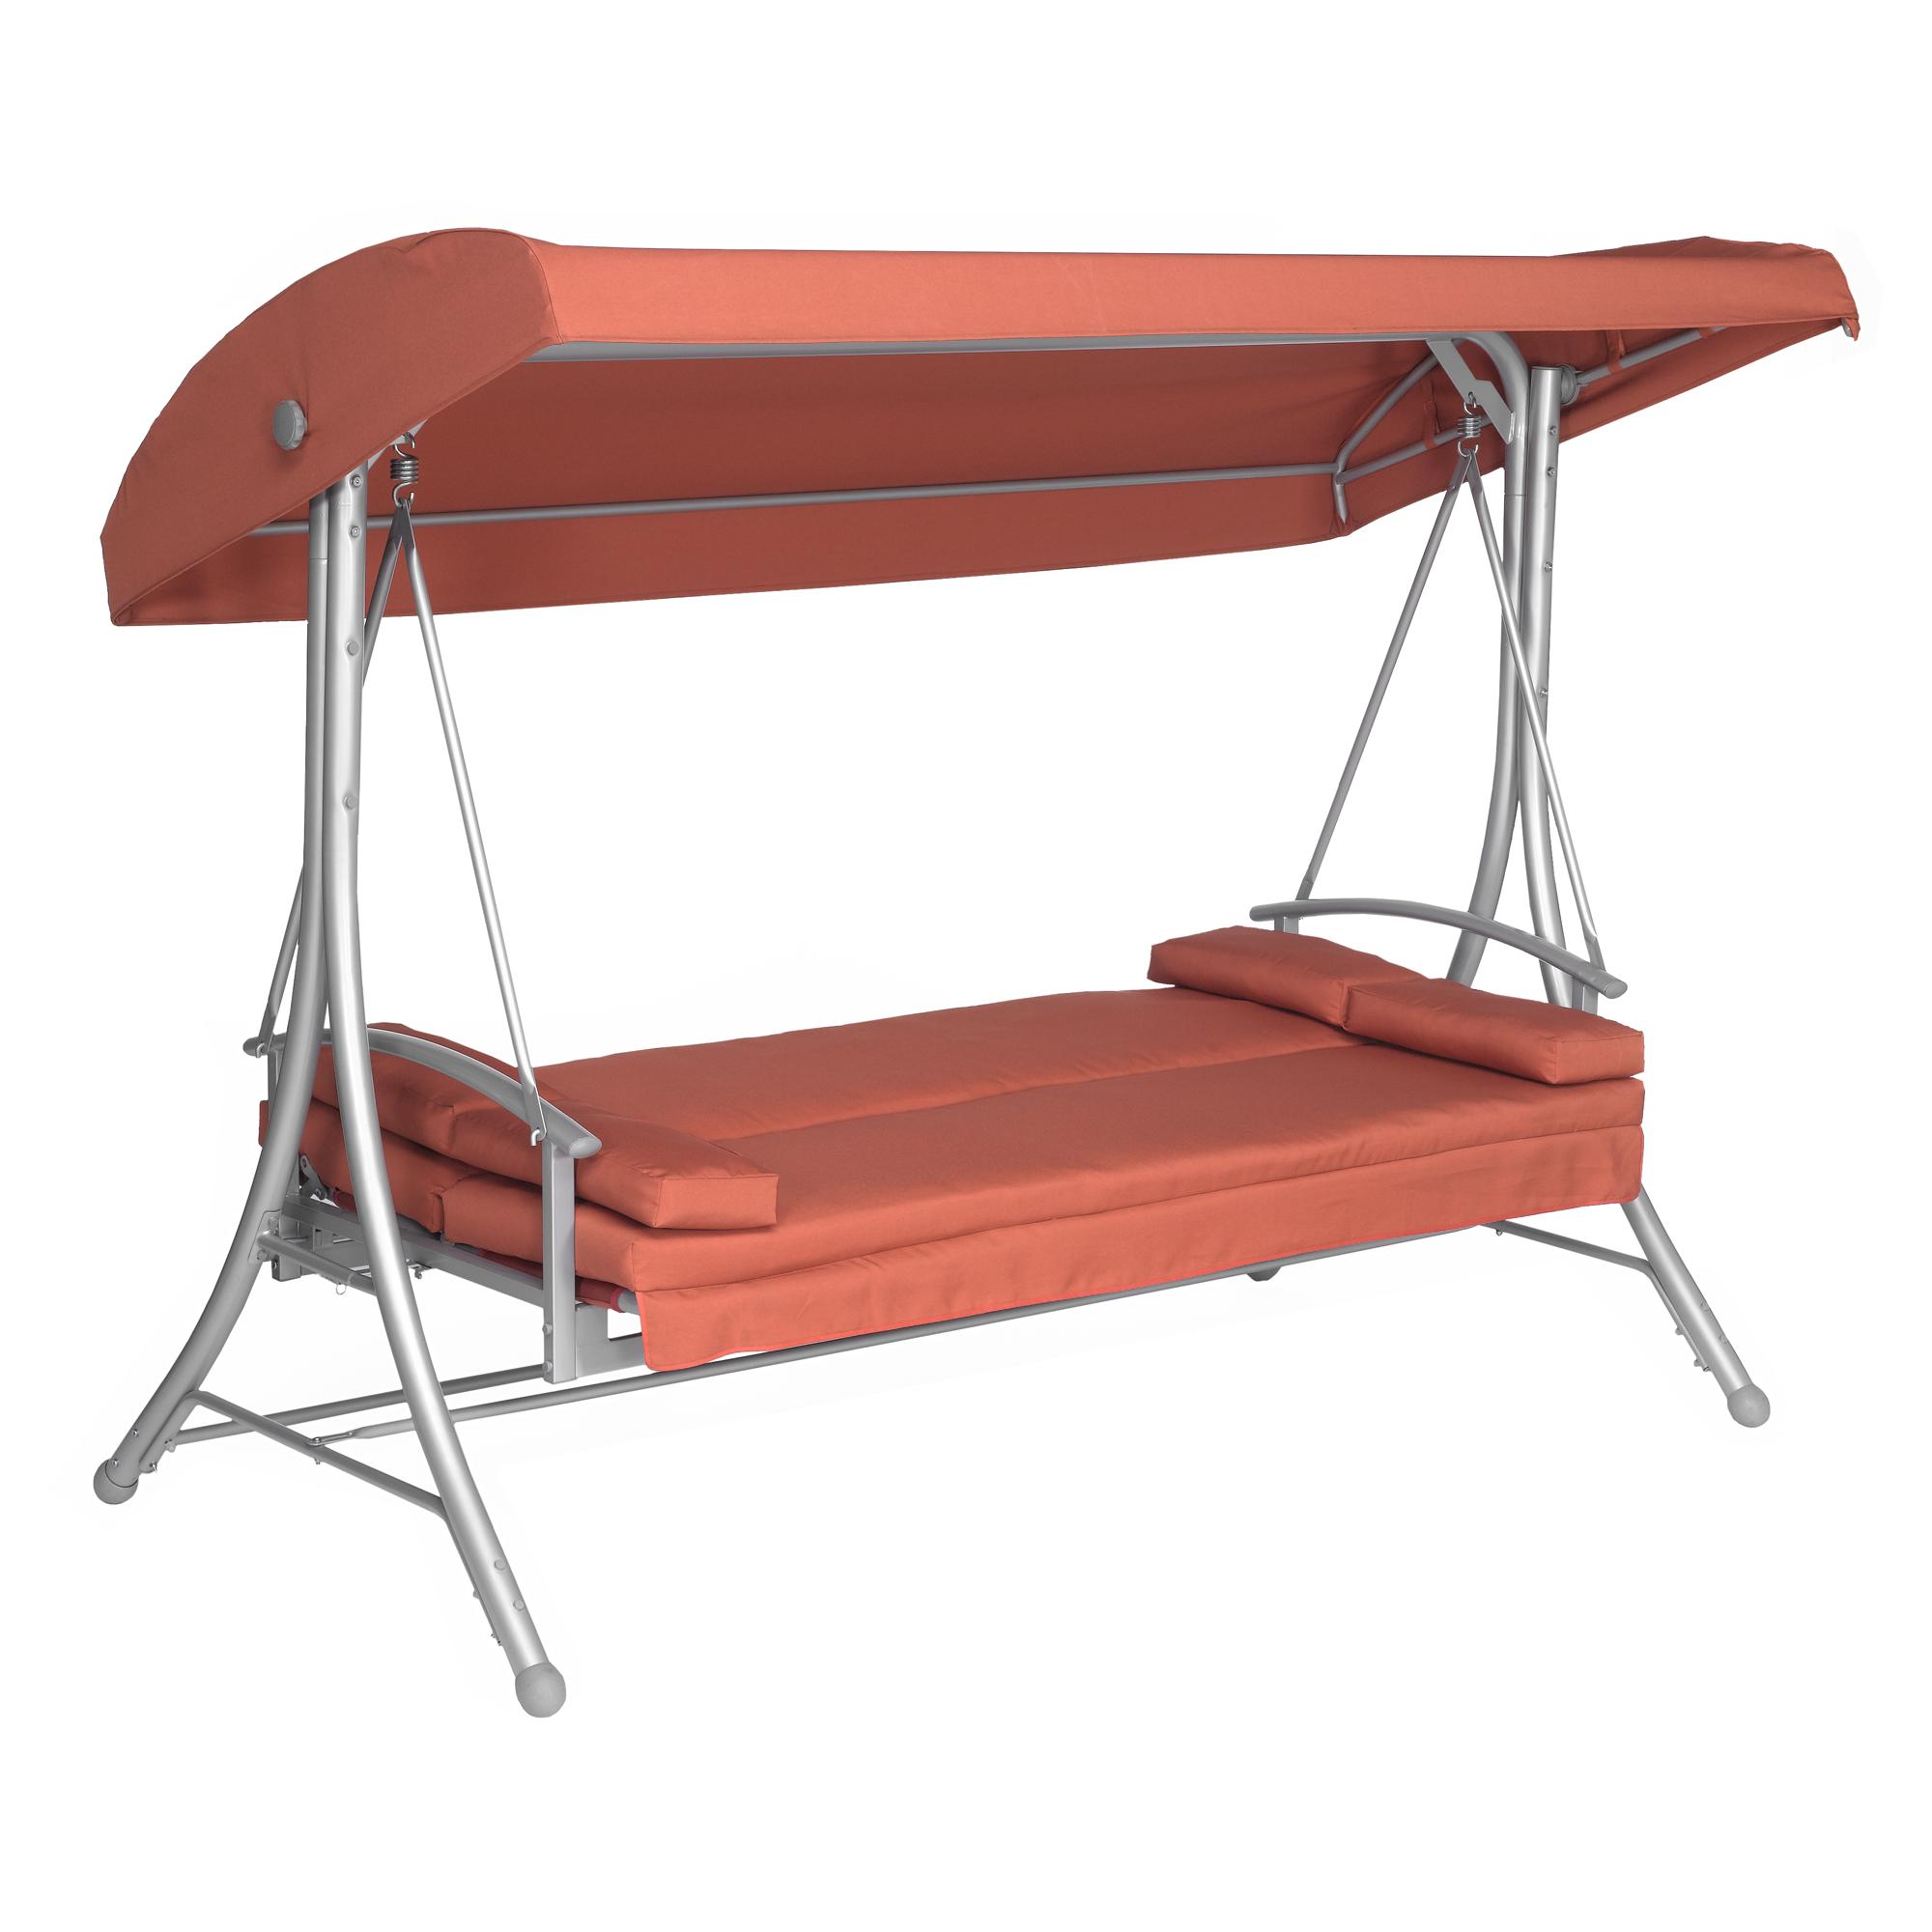 hollywoodschaukel sophia 3 sitzer lachsfarben toom. Black Bedroom Furniture Sets. Home Design Ideas